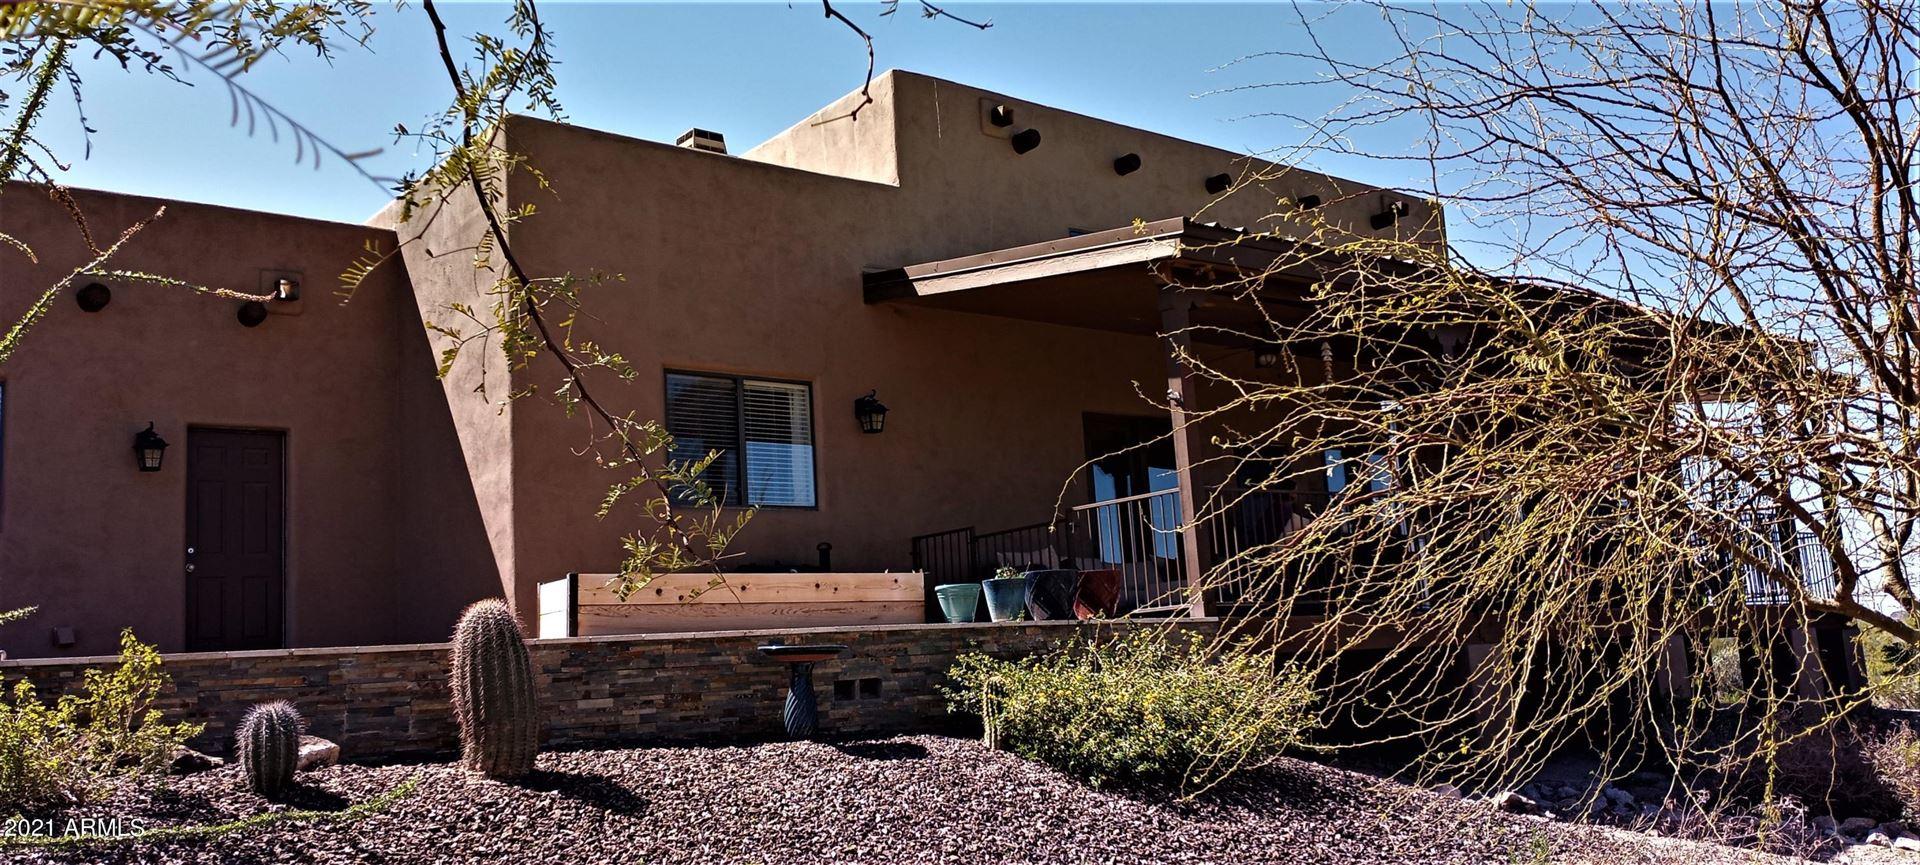 235 W RIDGECREST Road, Desert Hills, AZ 85086 - MLS#: 6212808